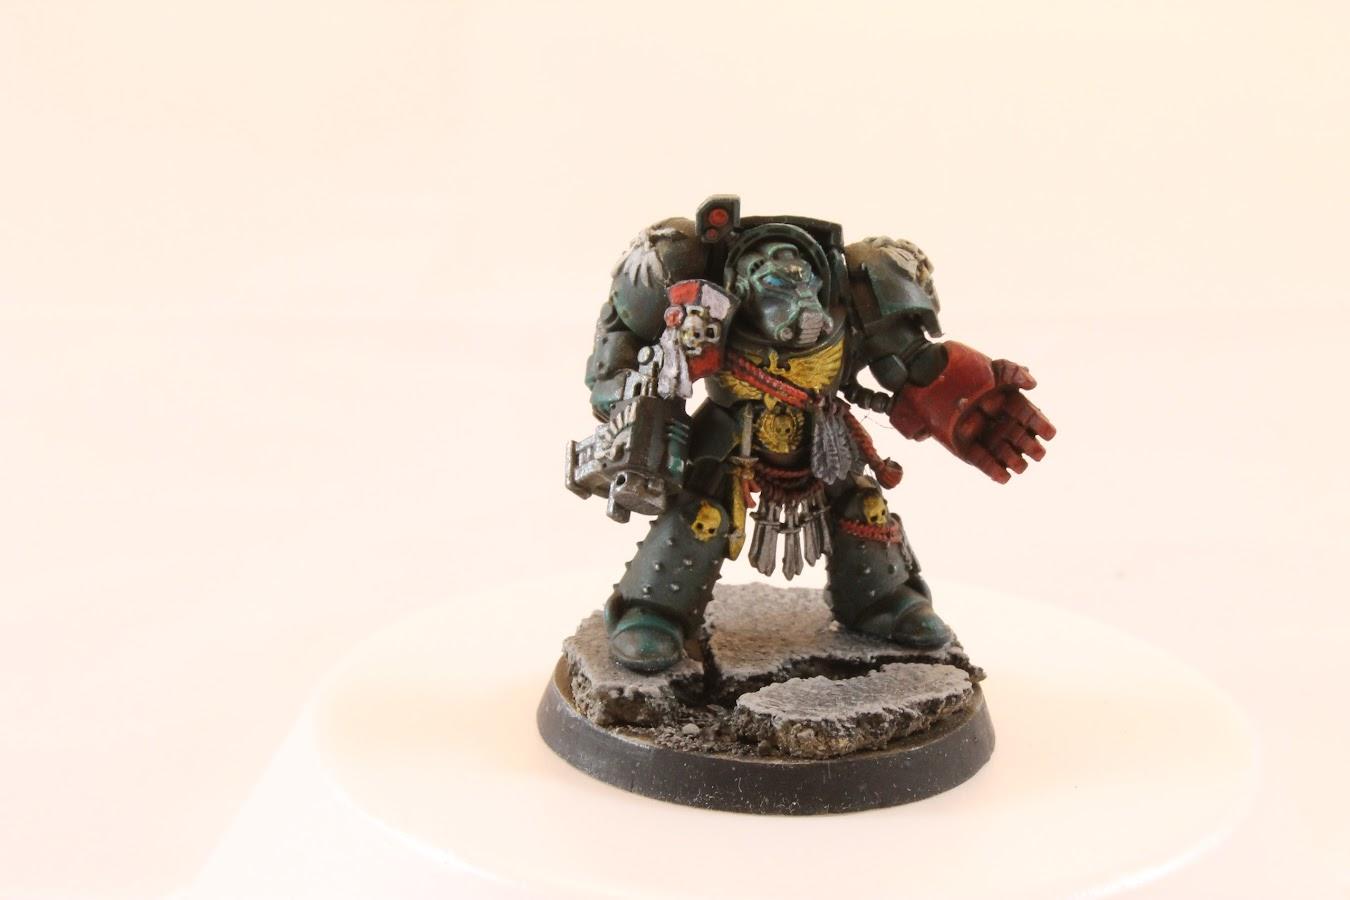 Terminator #5, painted